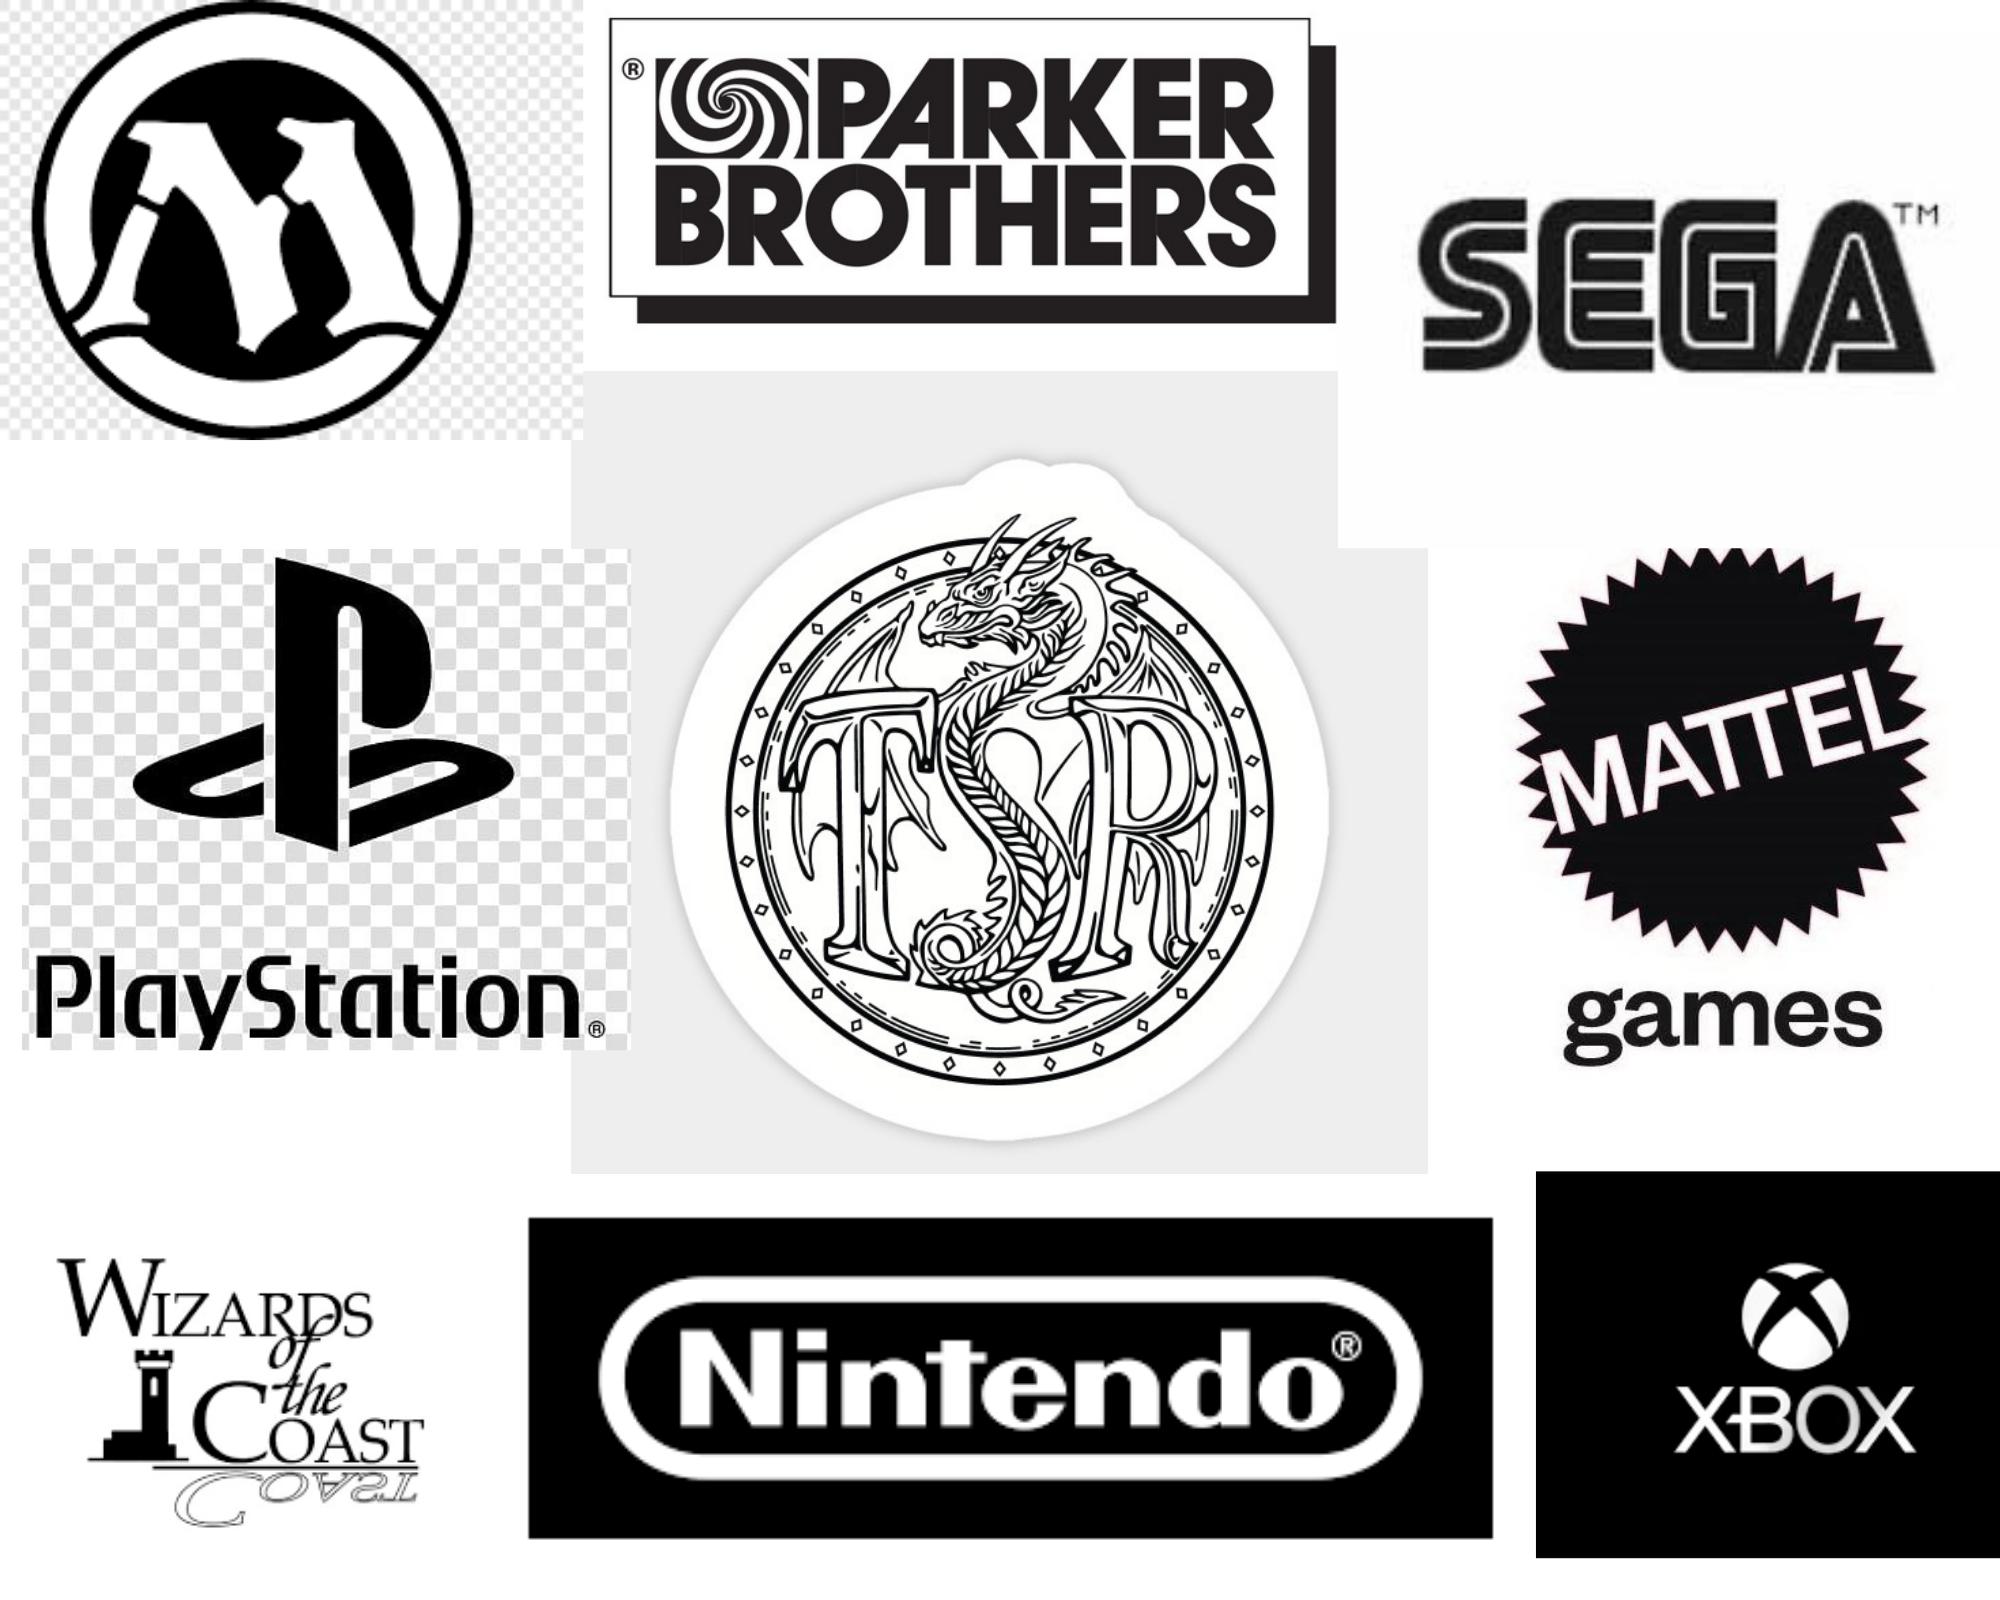 games, board games, video games, card games, RPG games, sega, mattel, nintendo, Wizards of the coast, Play Station, X box, Parker Brothers, Milton Bradley, Magic, Pokemon,